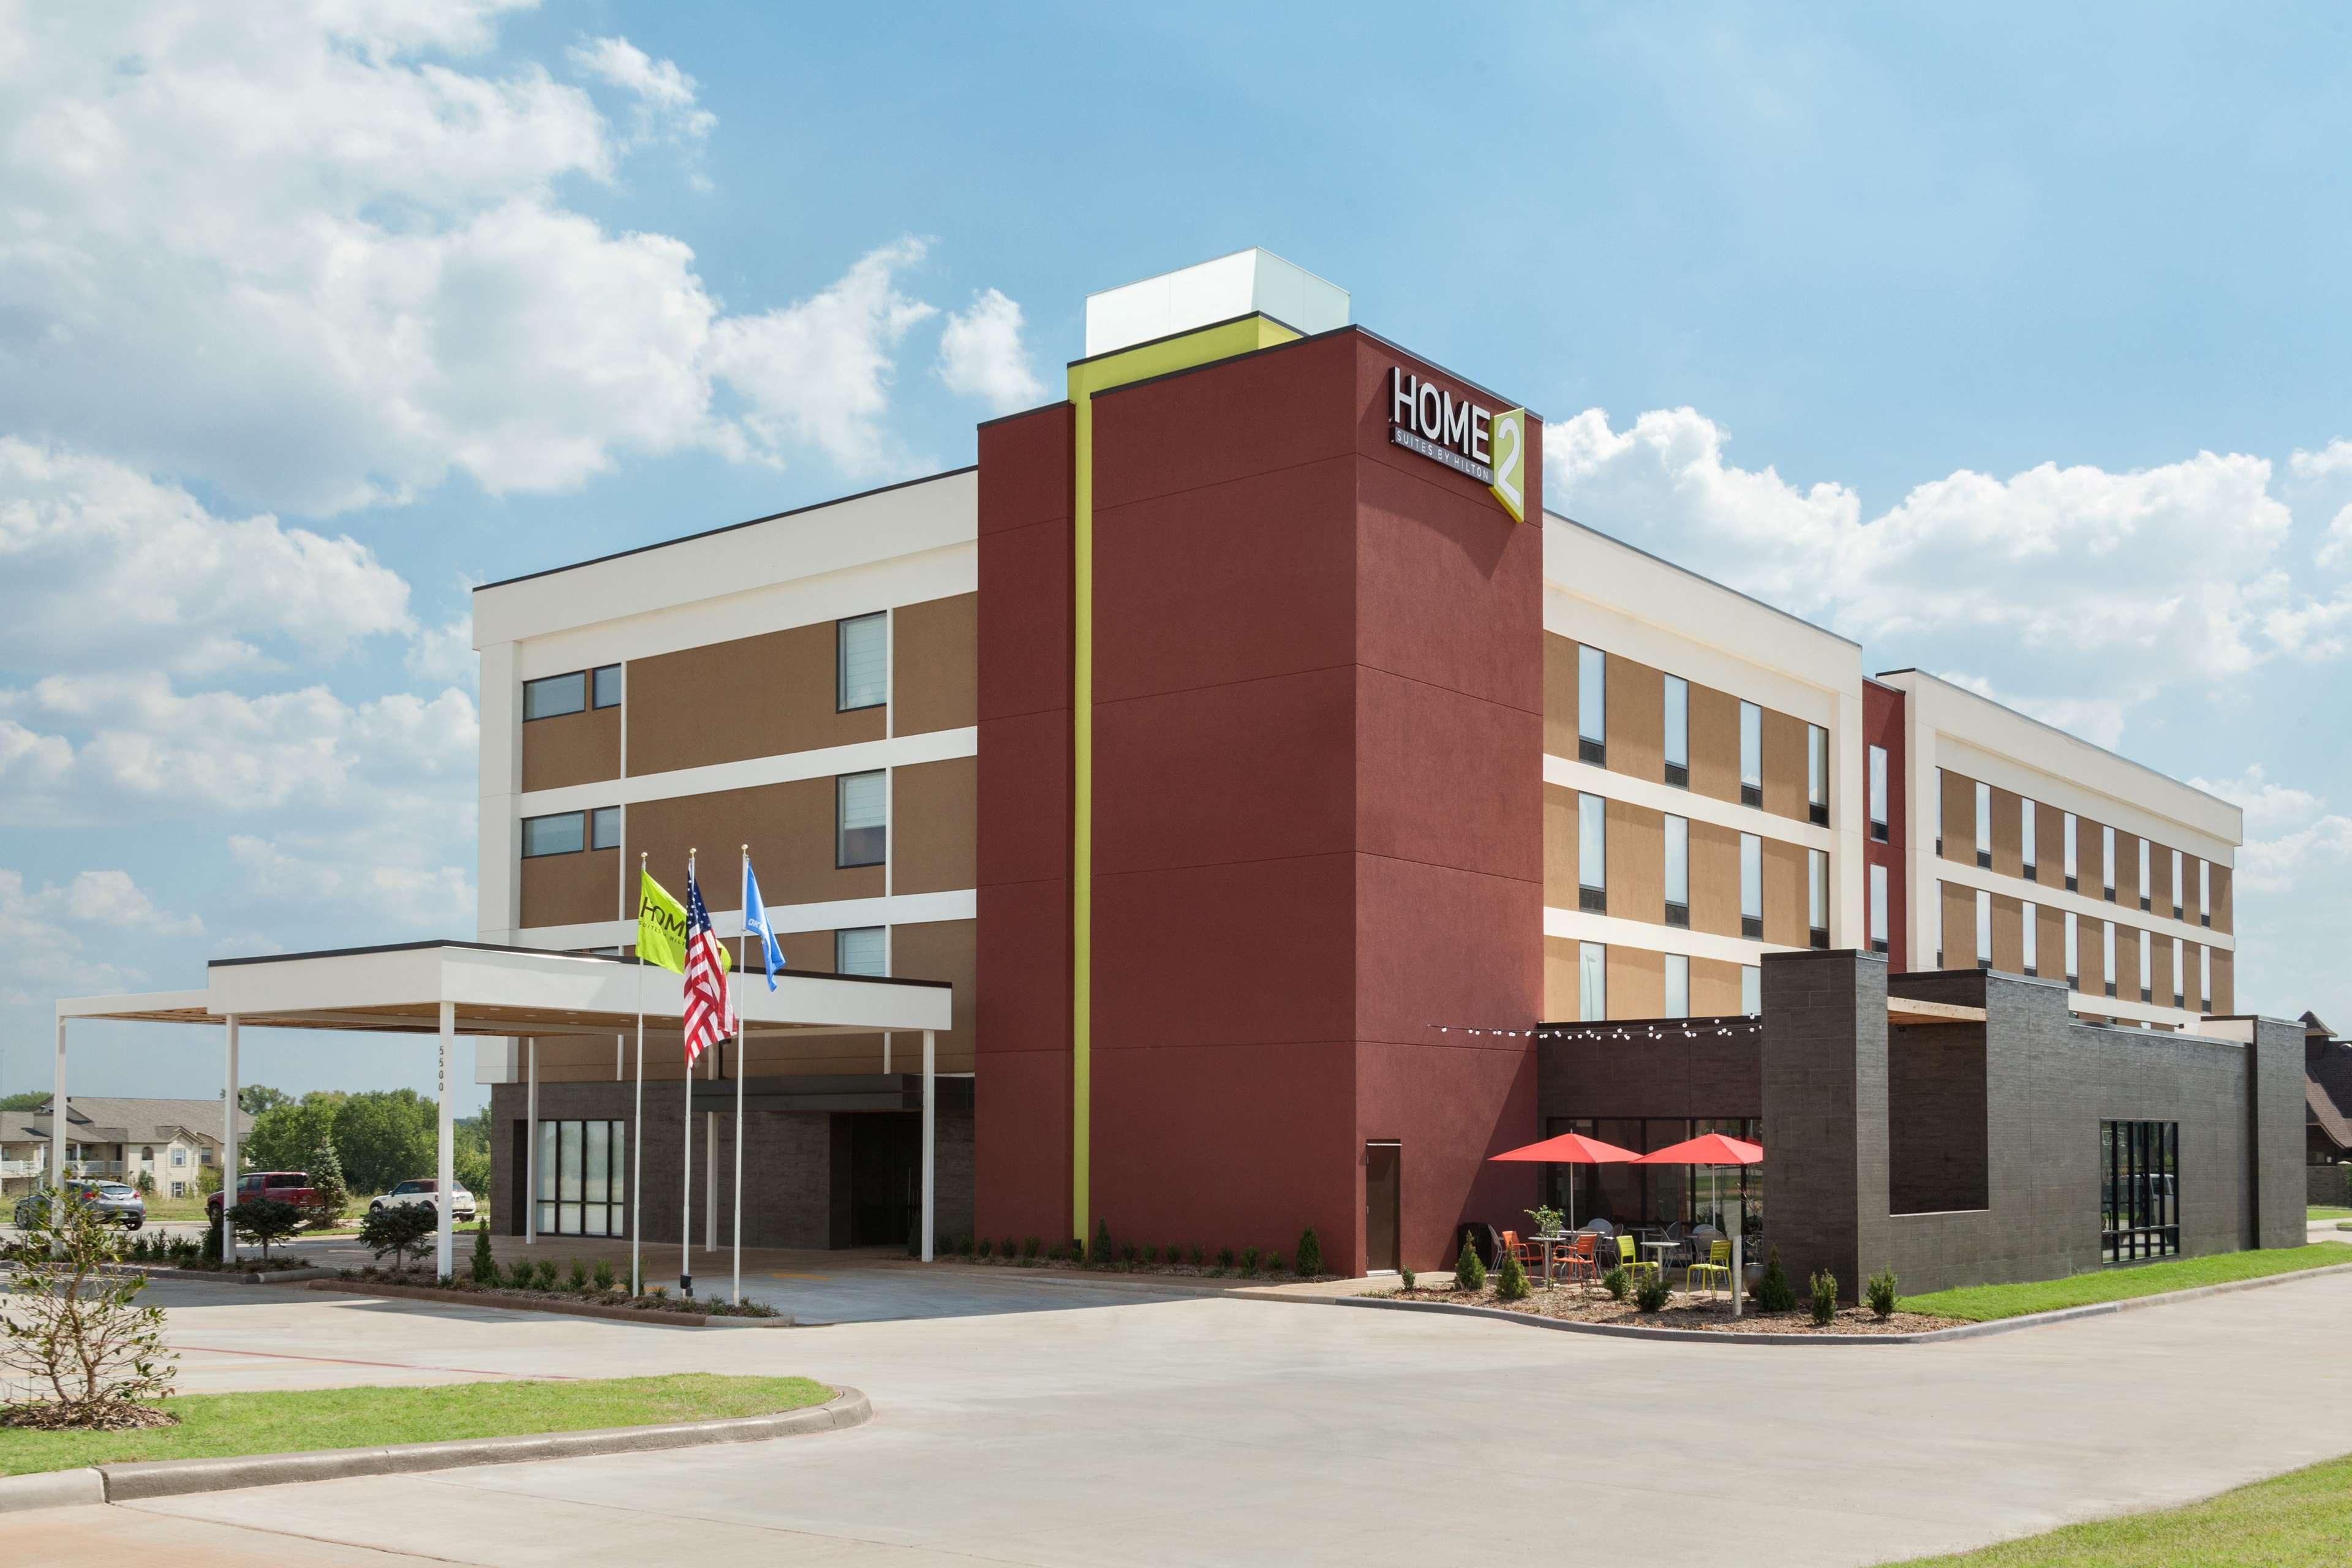 Home2 Suites by Hilton Oklahoma City Quail Springs